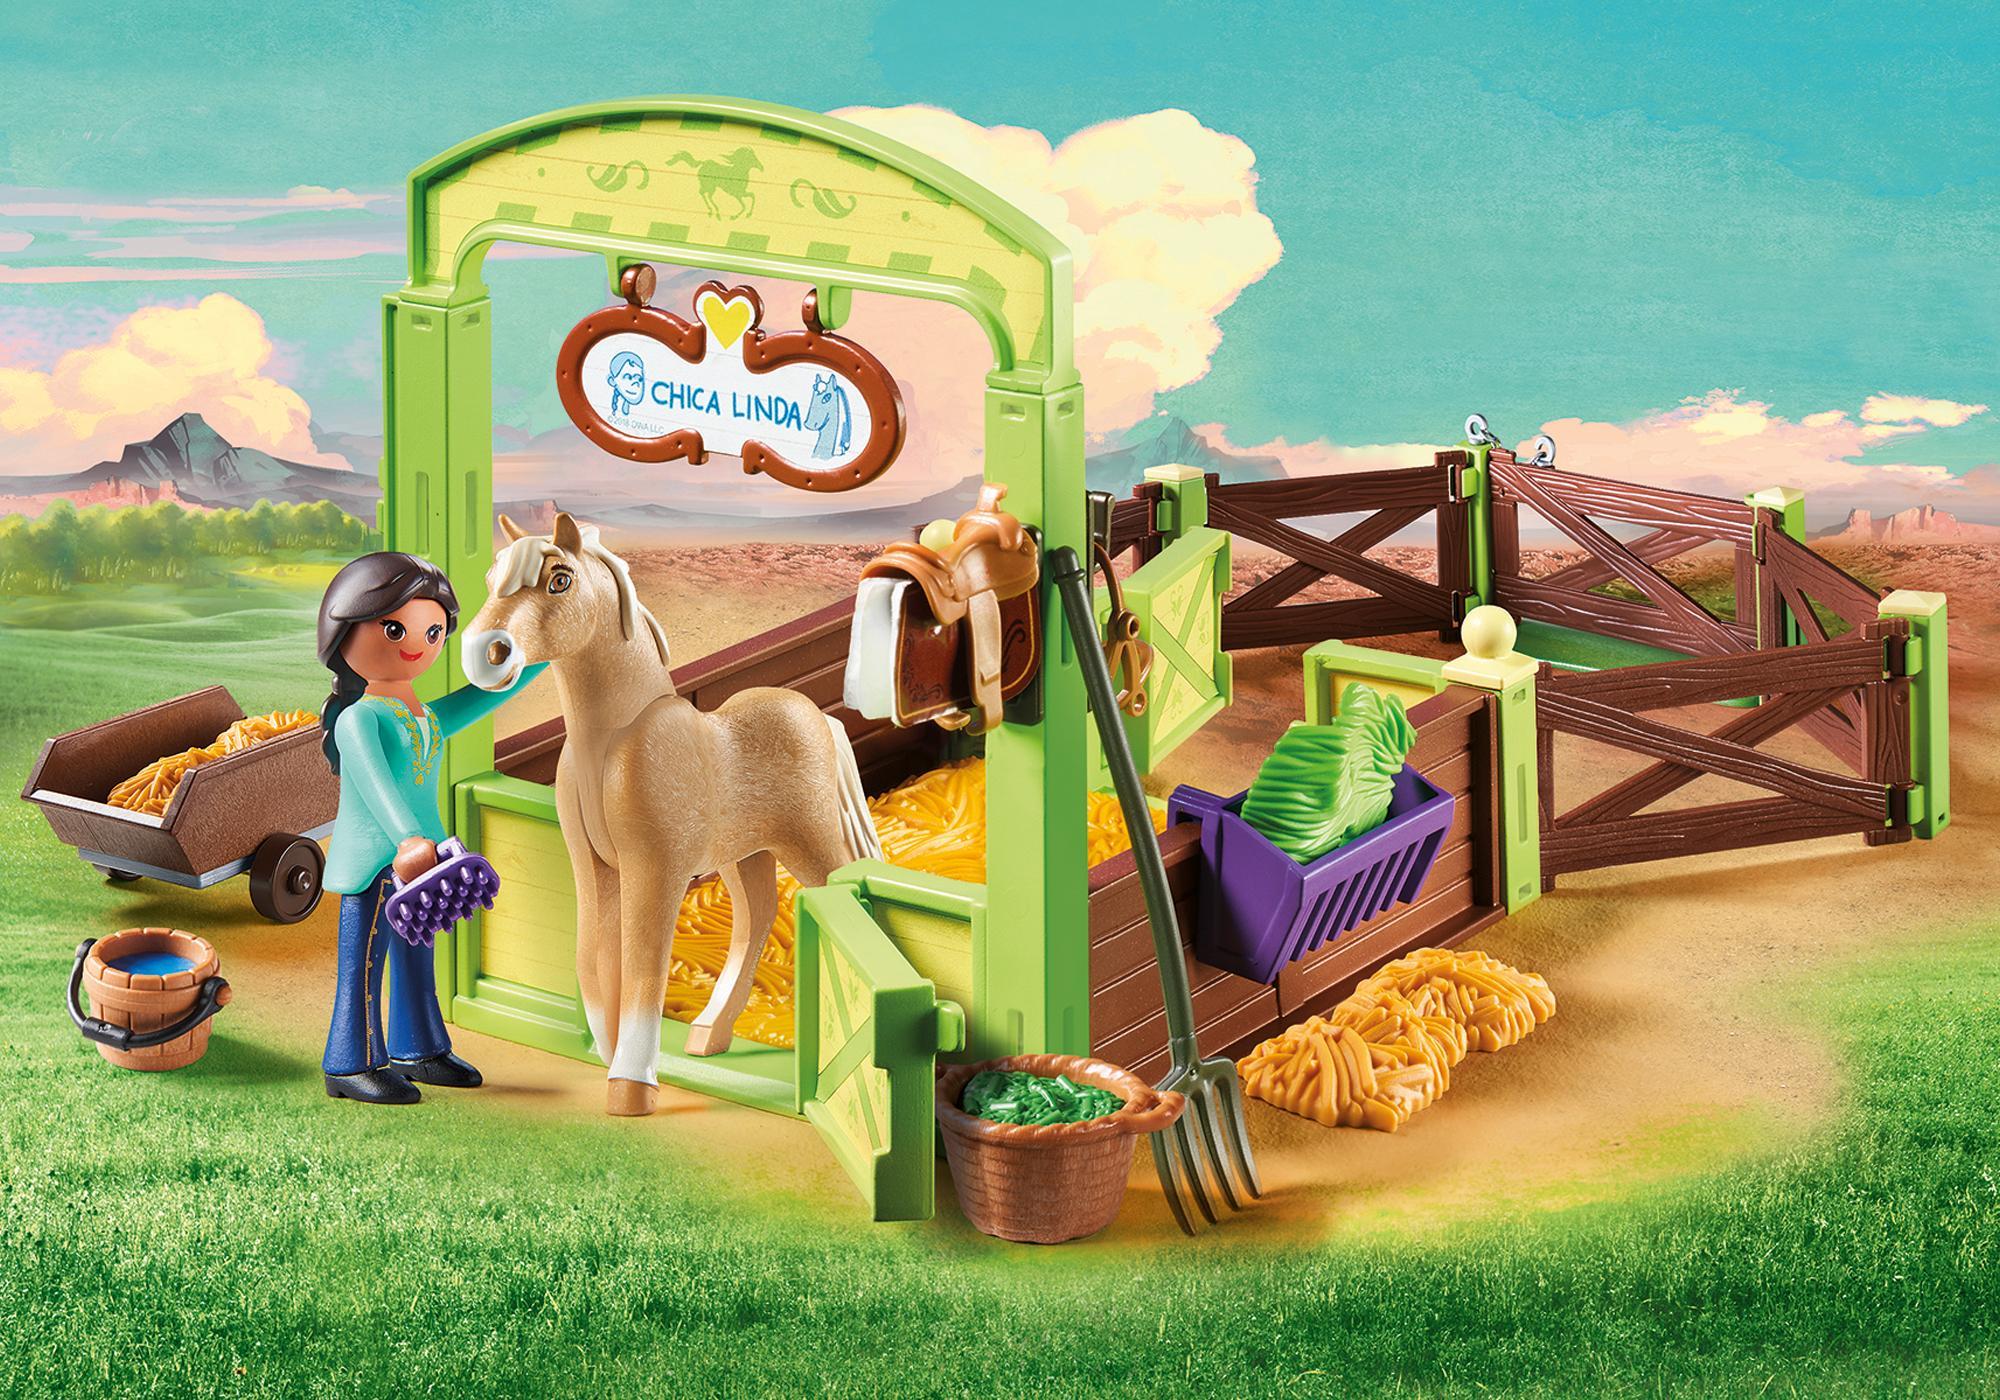 http://media.playmobil.com/i/playmobil/9479_product_detail/Pru & Chica Linda met paardenbox